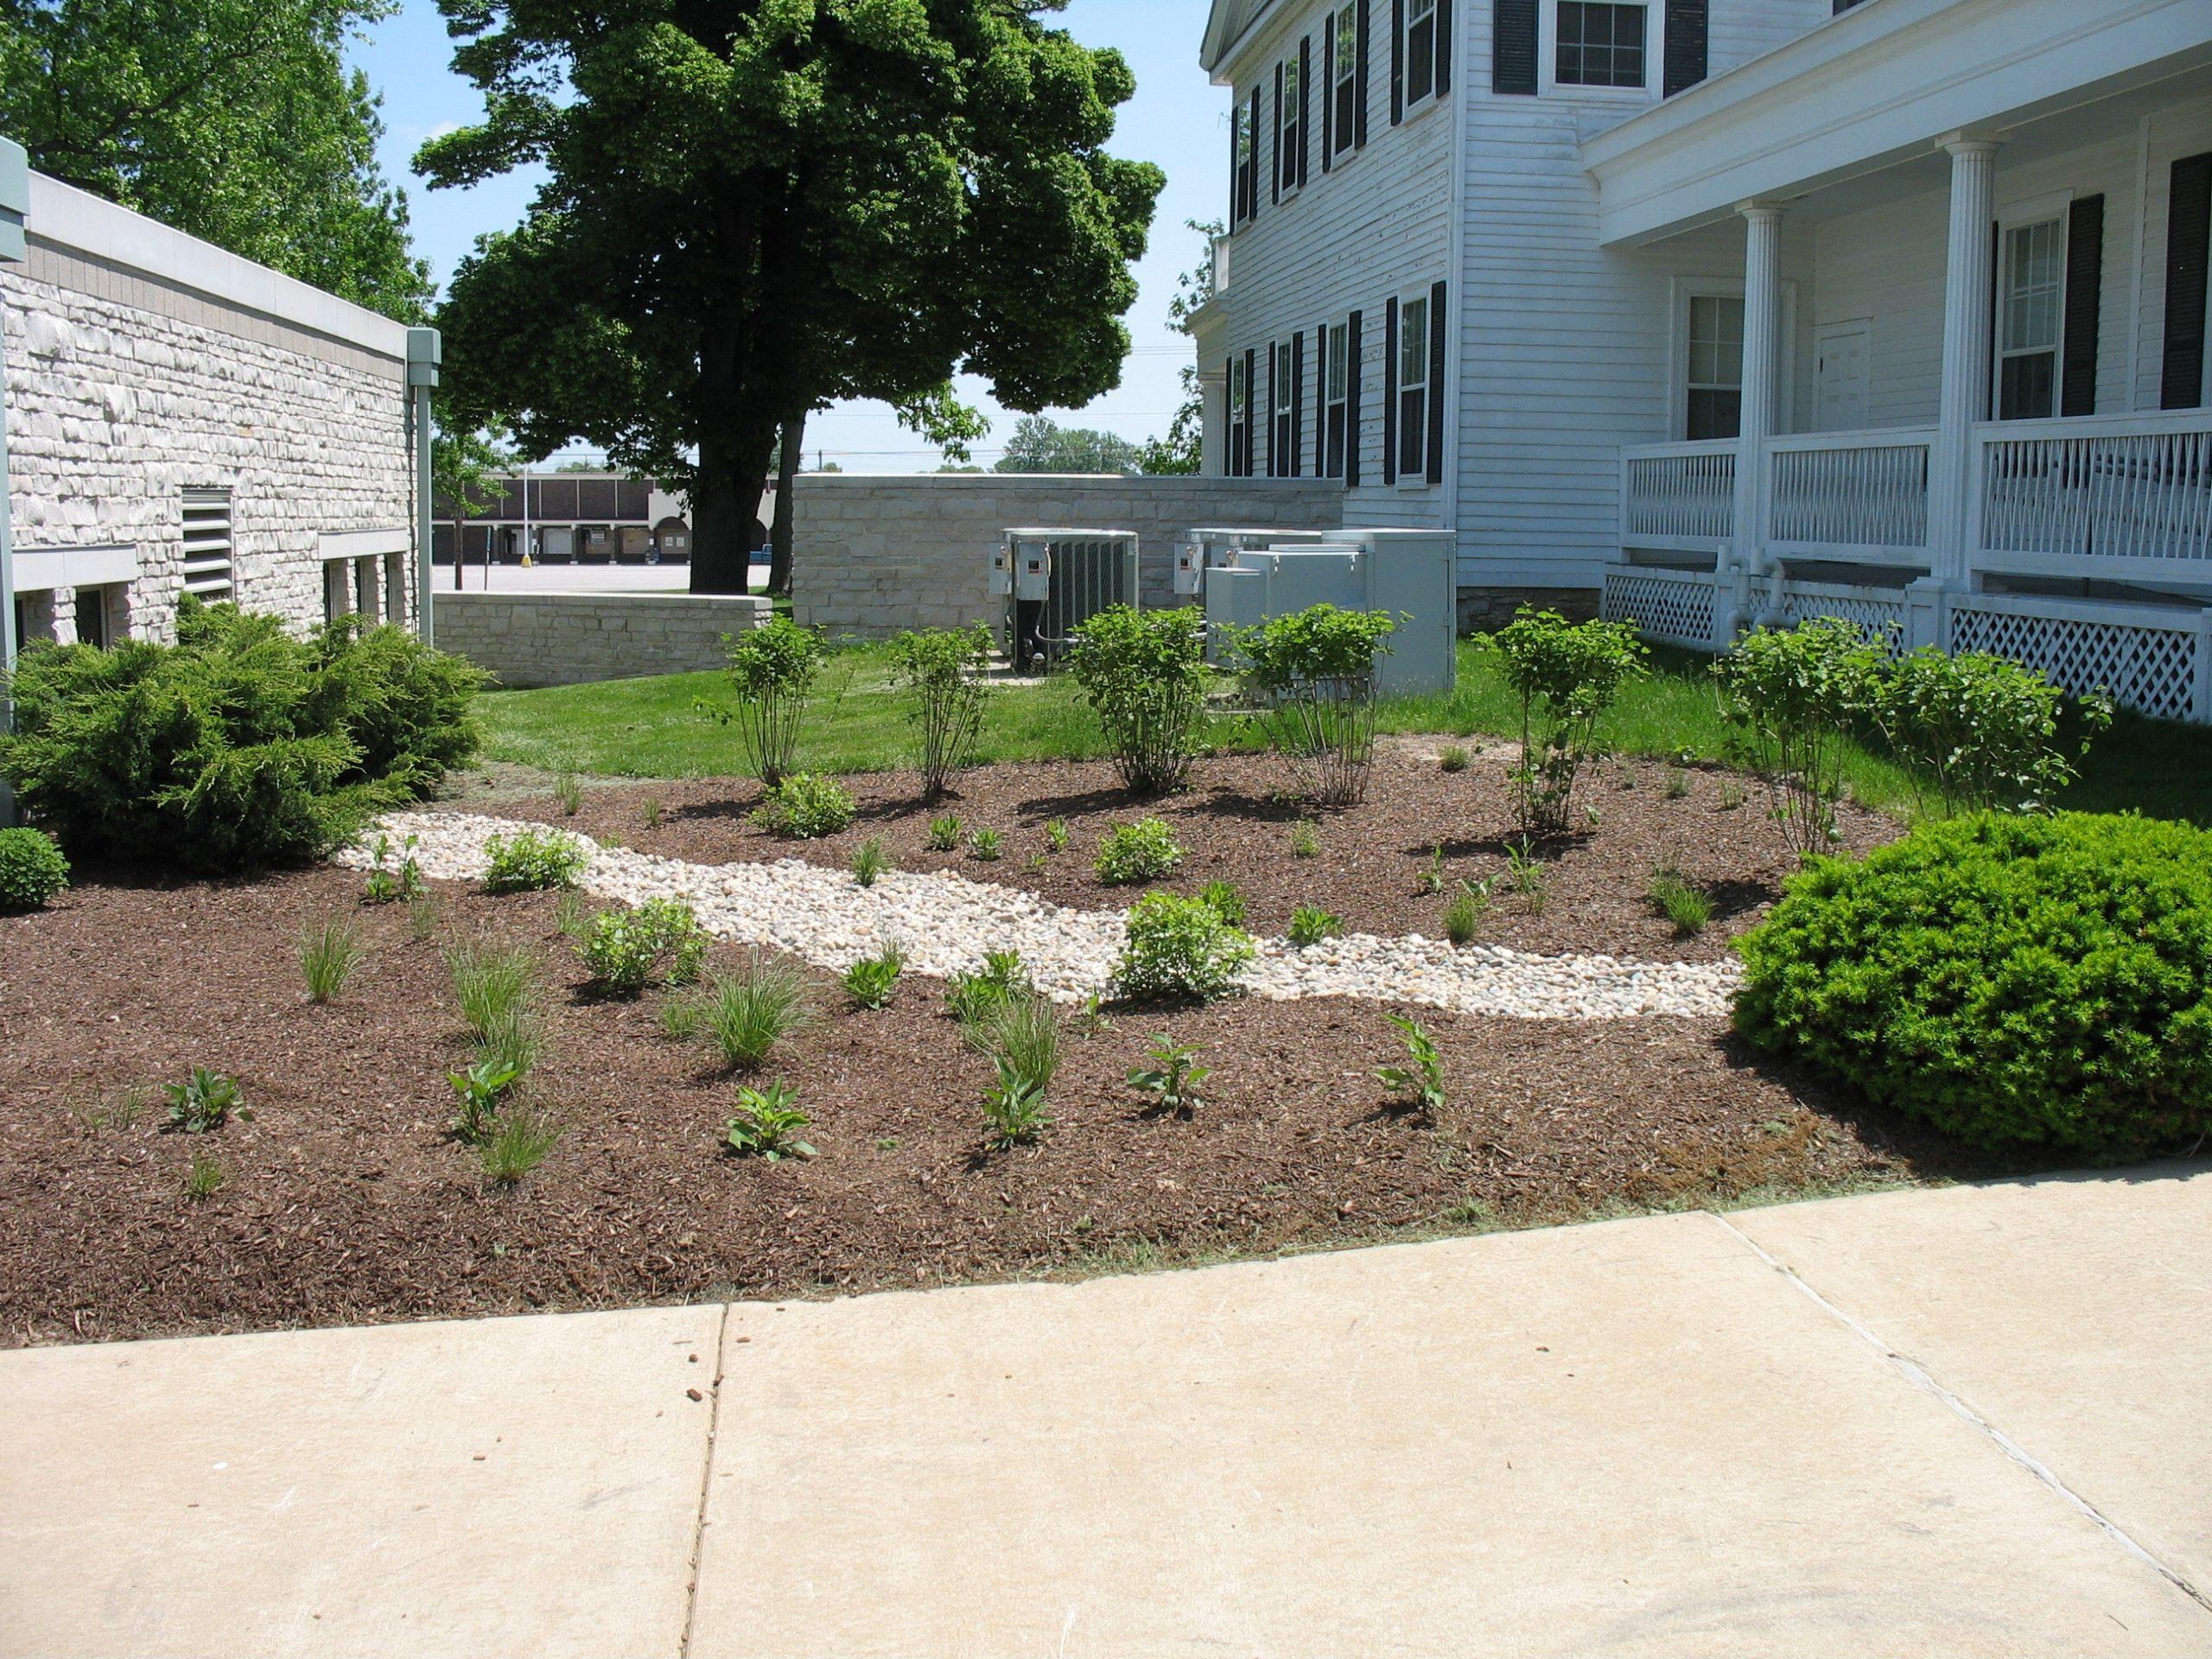 Newly planted rain garden at school